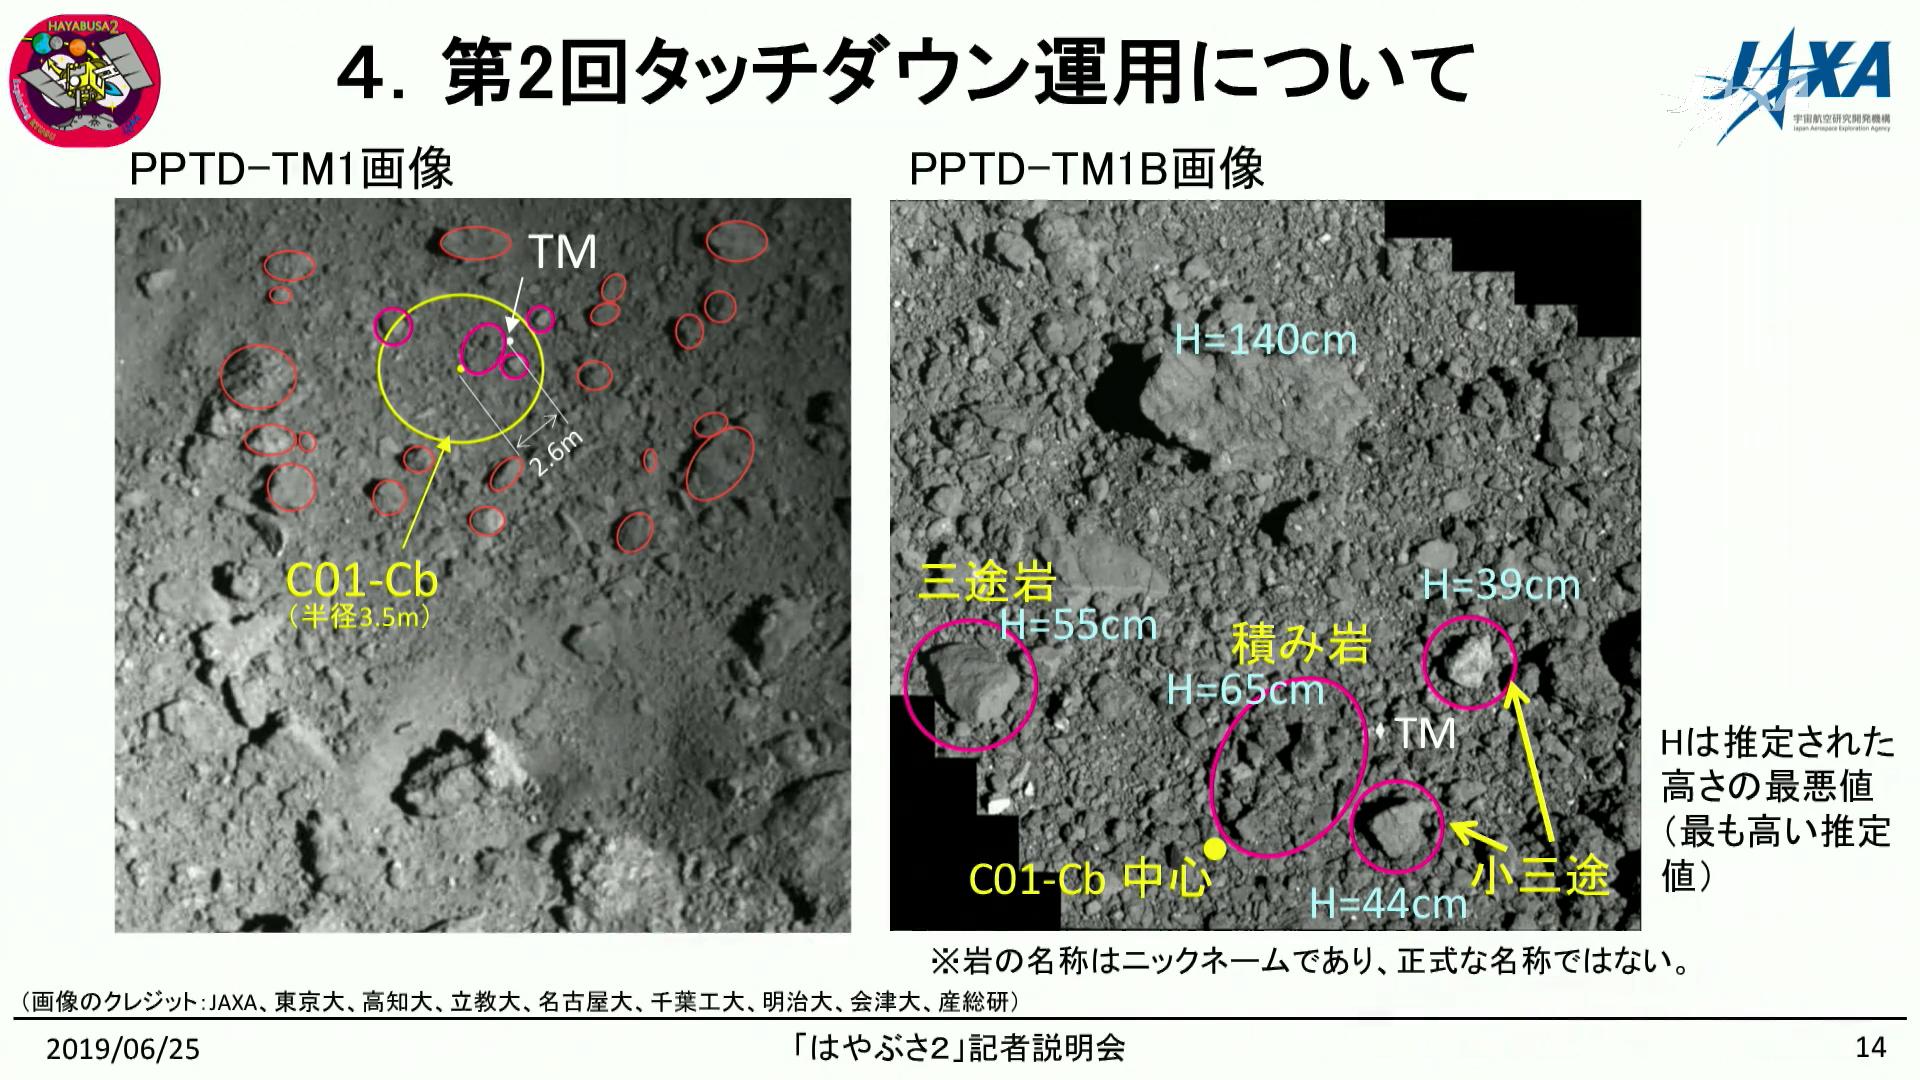 f:id:Imamura:20190625234750p:plain